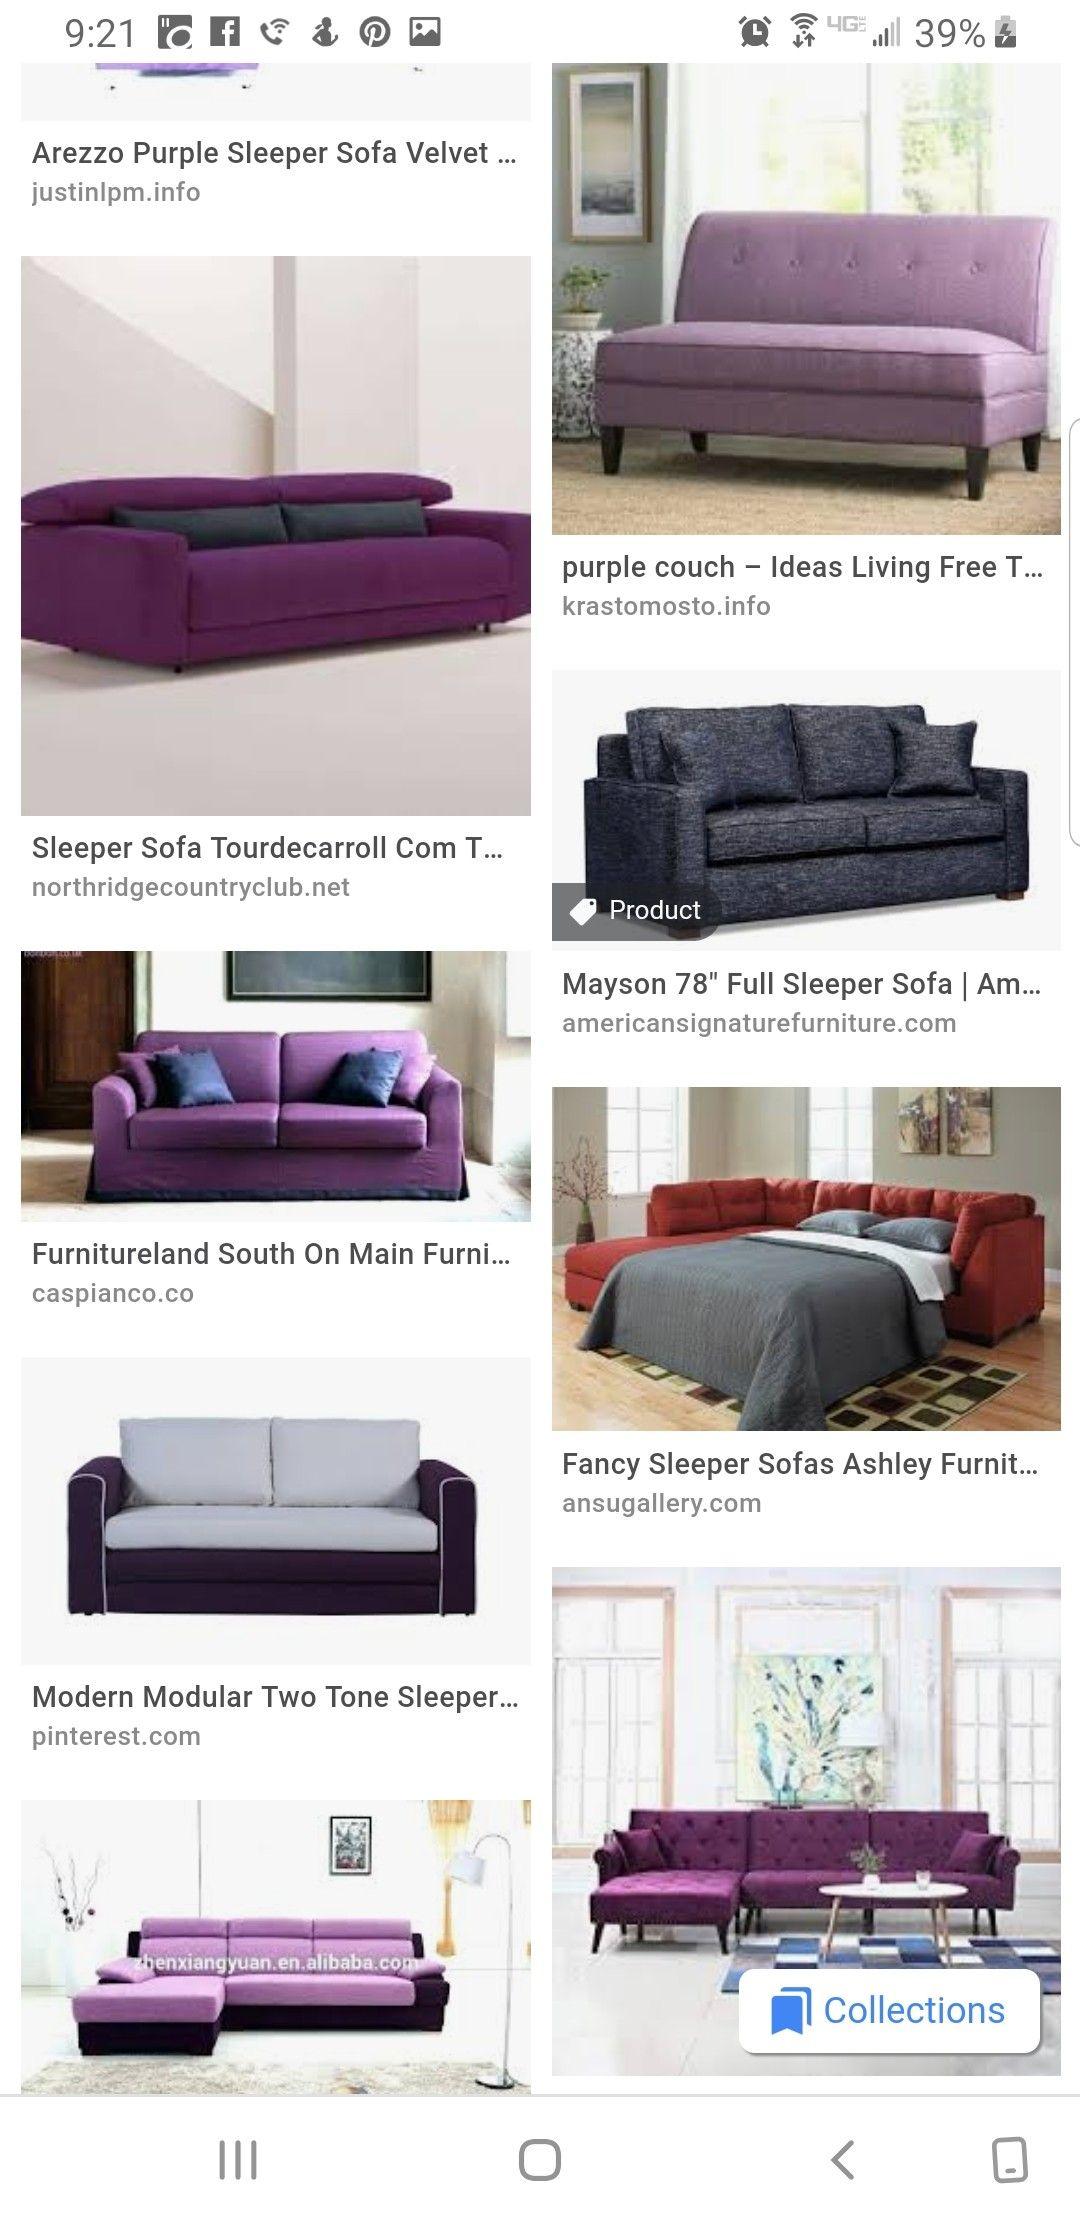 Pin By J On Sleep Sofa With Images Sleep Sofa Purple Couch